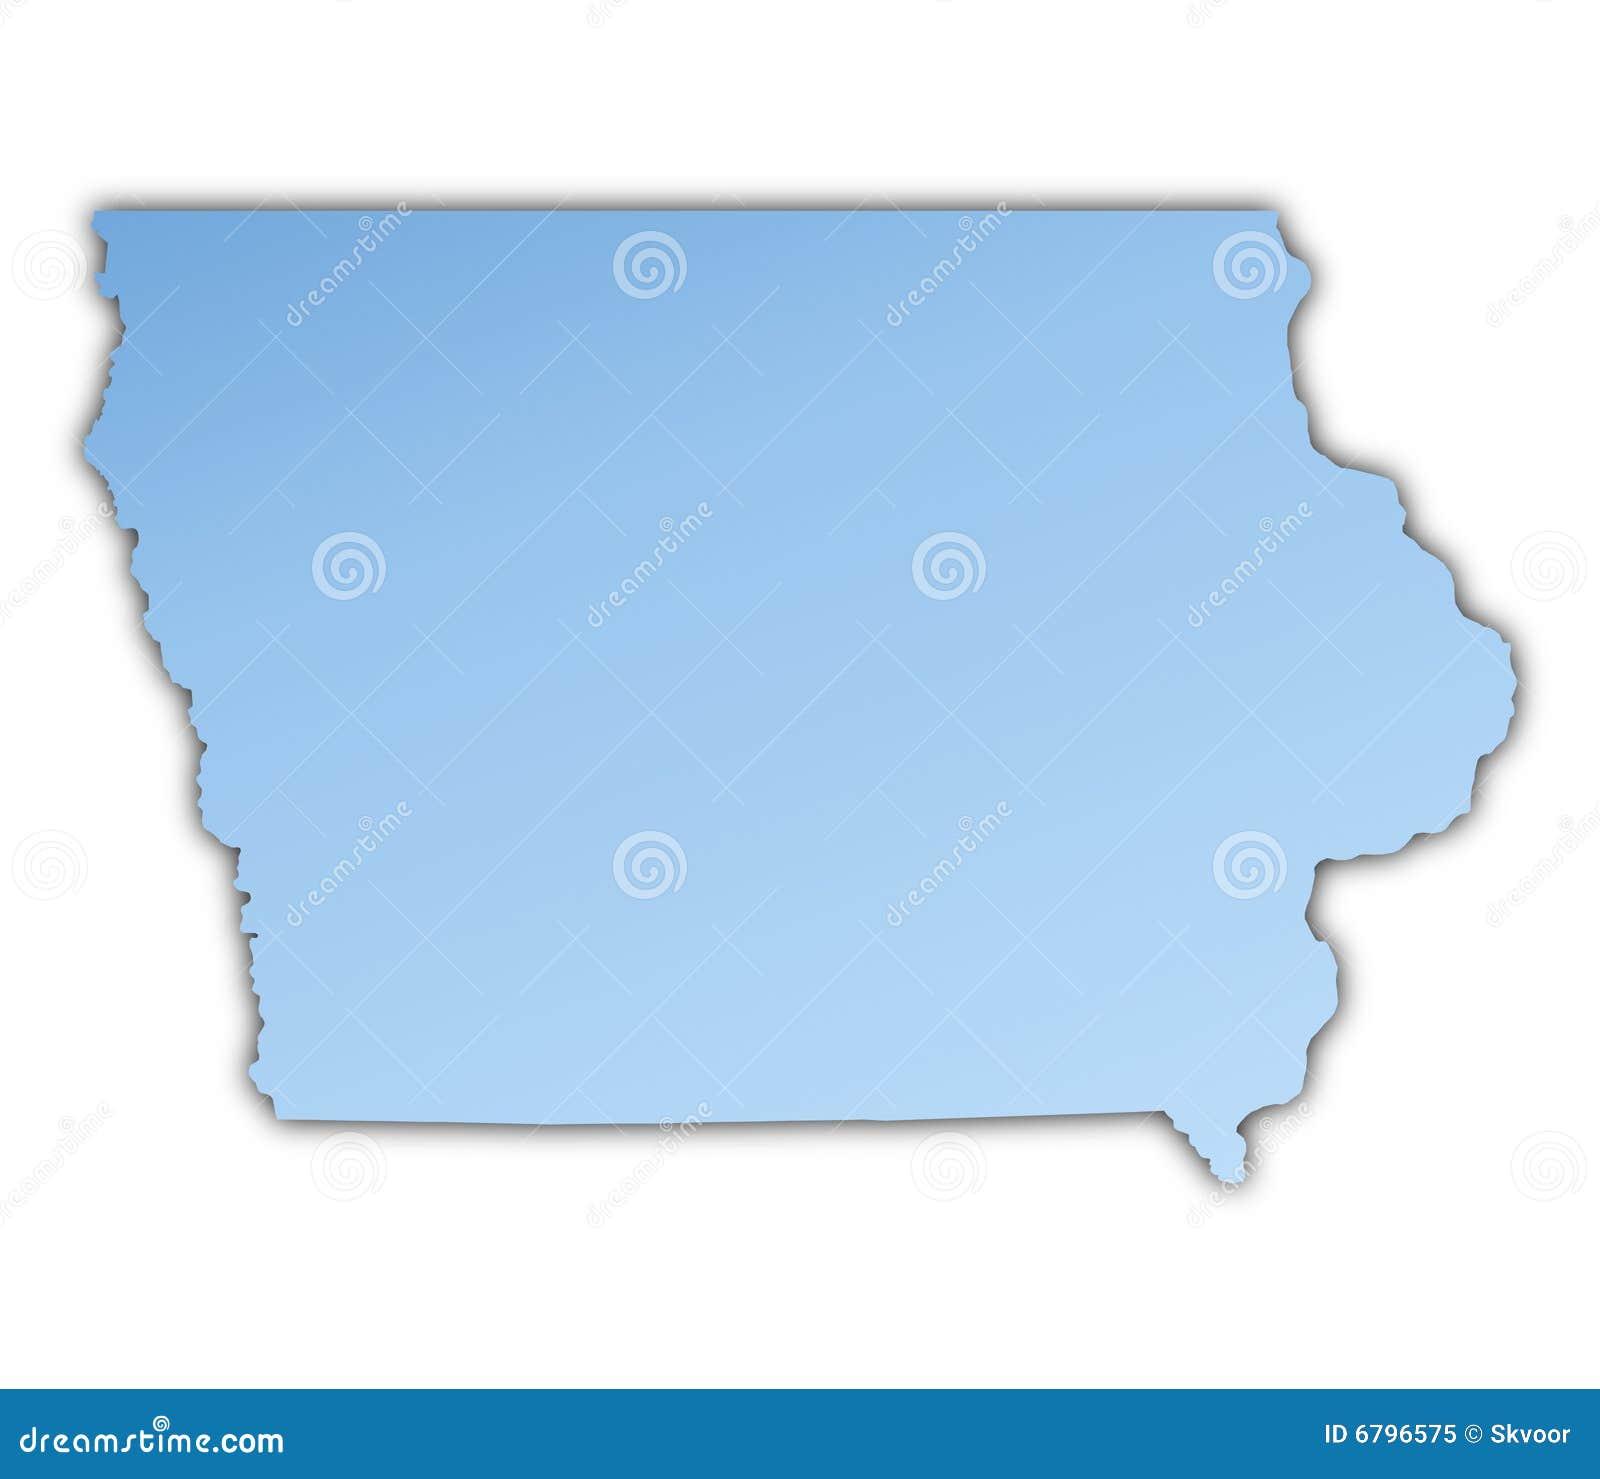 Iowa On Usa Map.Iowa Usa Map Stock Illustration Illustration Of Illustration 6796575